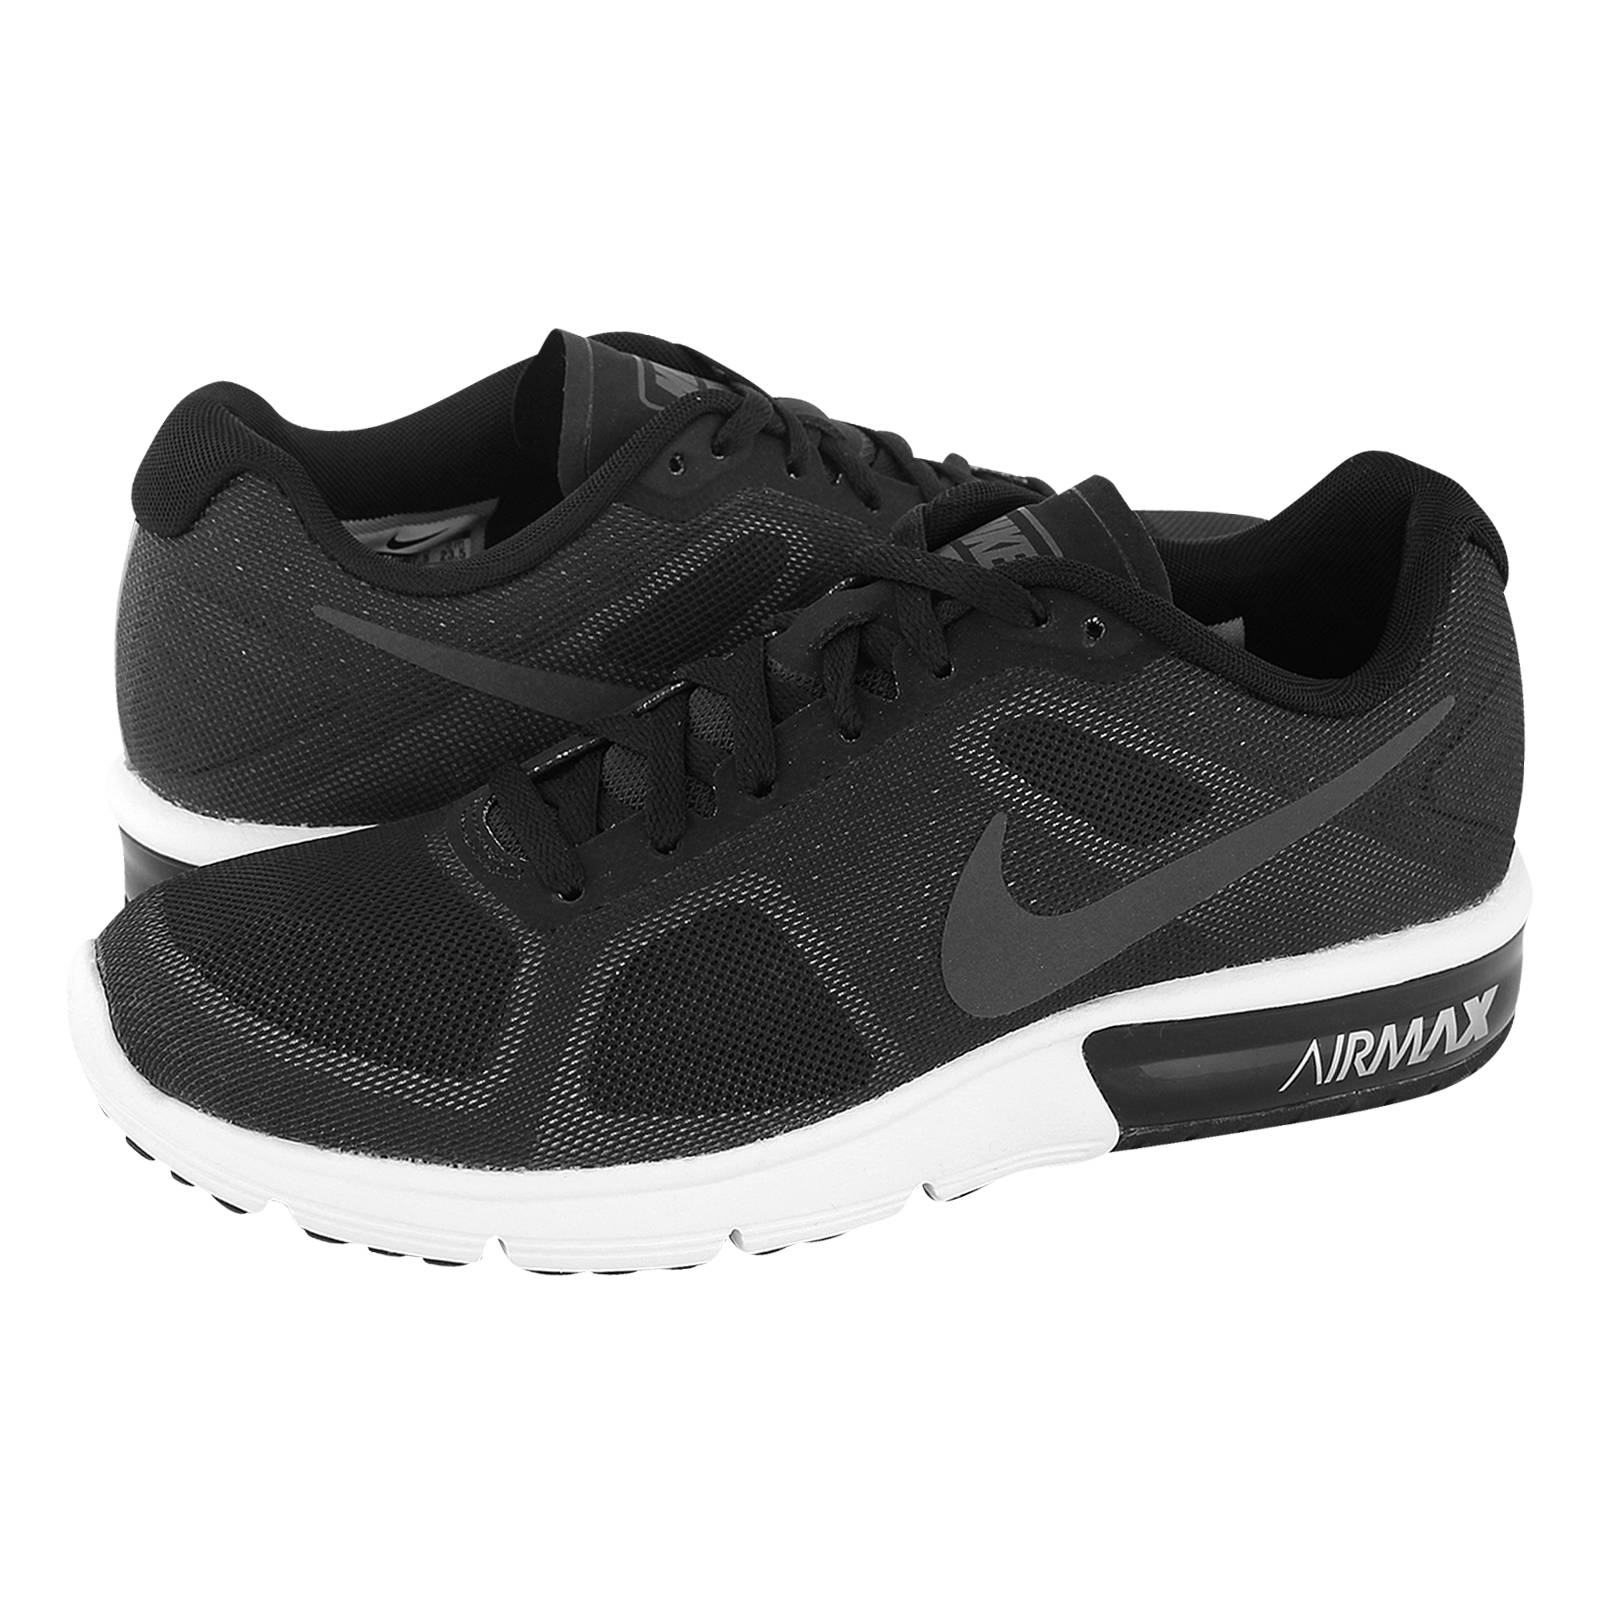 Air Max Sequent - Γυναικεία αθλητικά παπούτσια Nike από υφασμα ... ef2857e4912